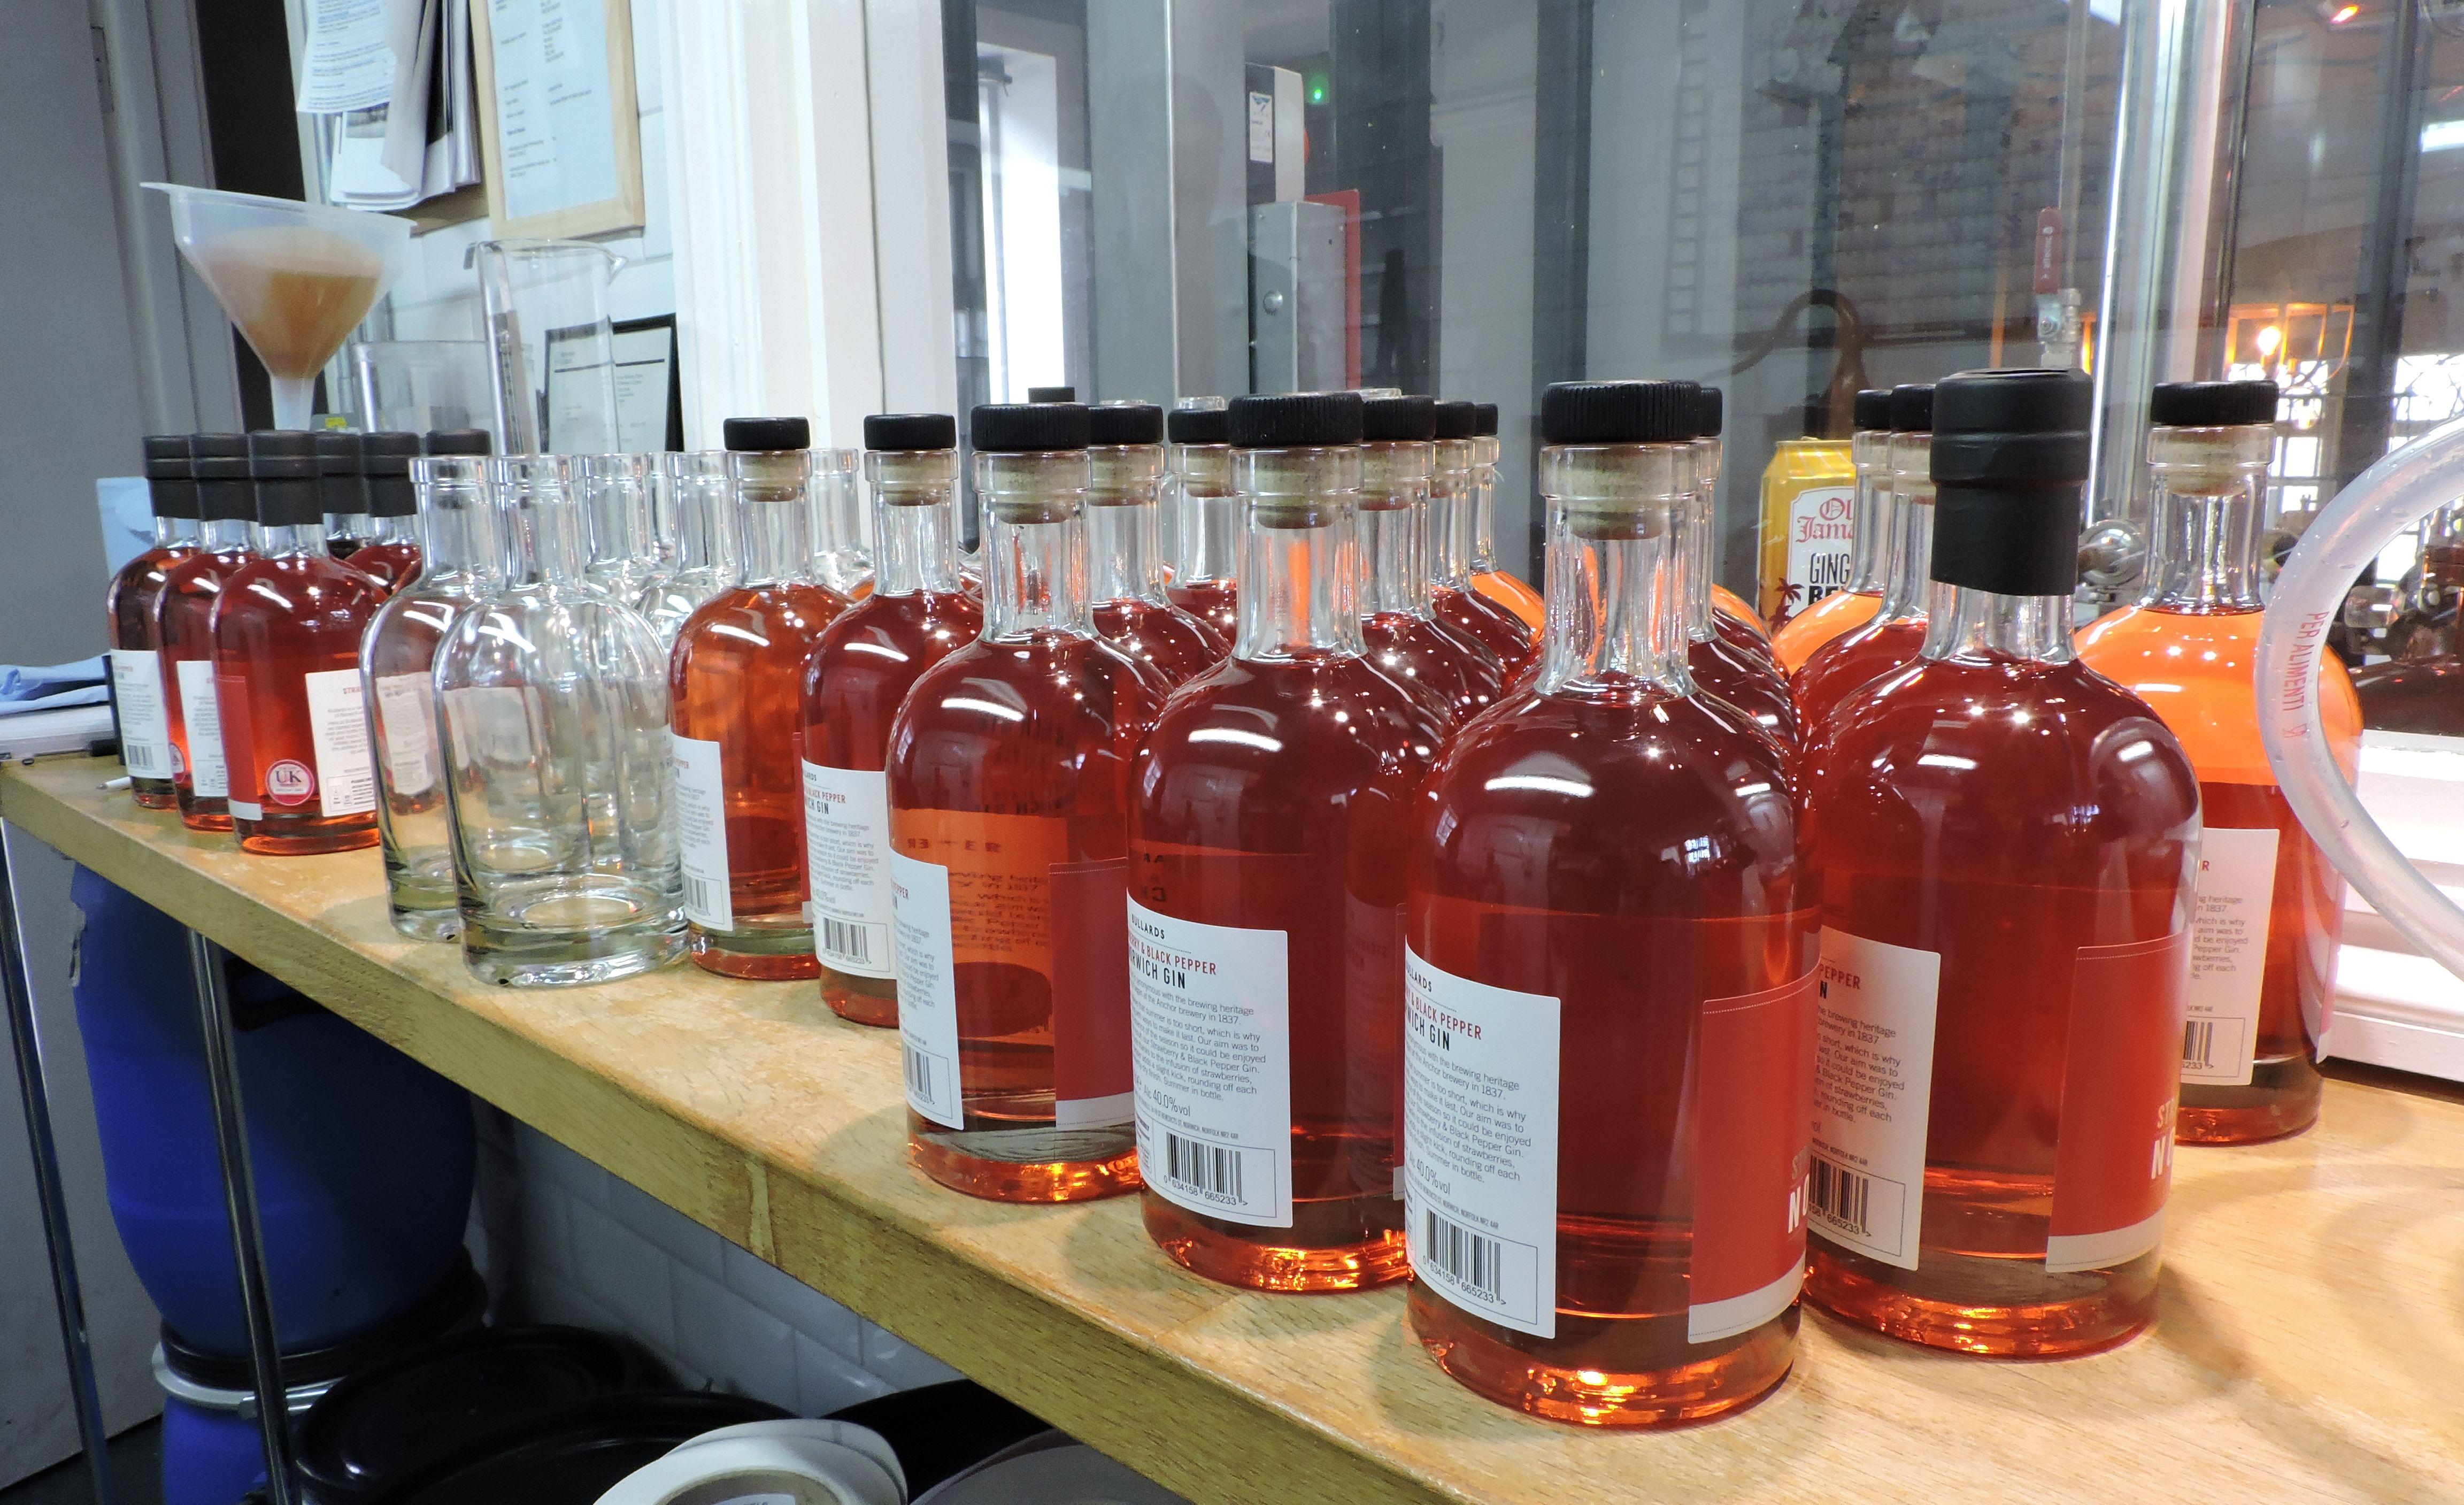 Bullards Strawberry Black Pepper Gin From Norwich Norfolk Artisan Gin Gin Brands Gin